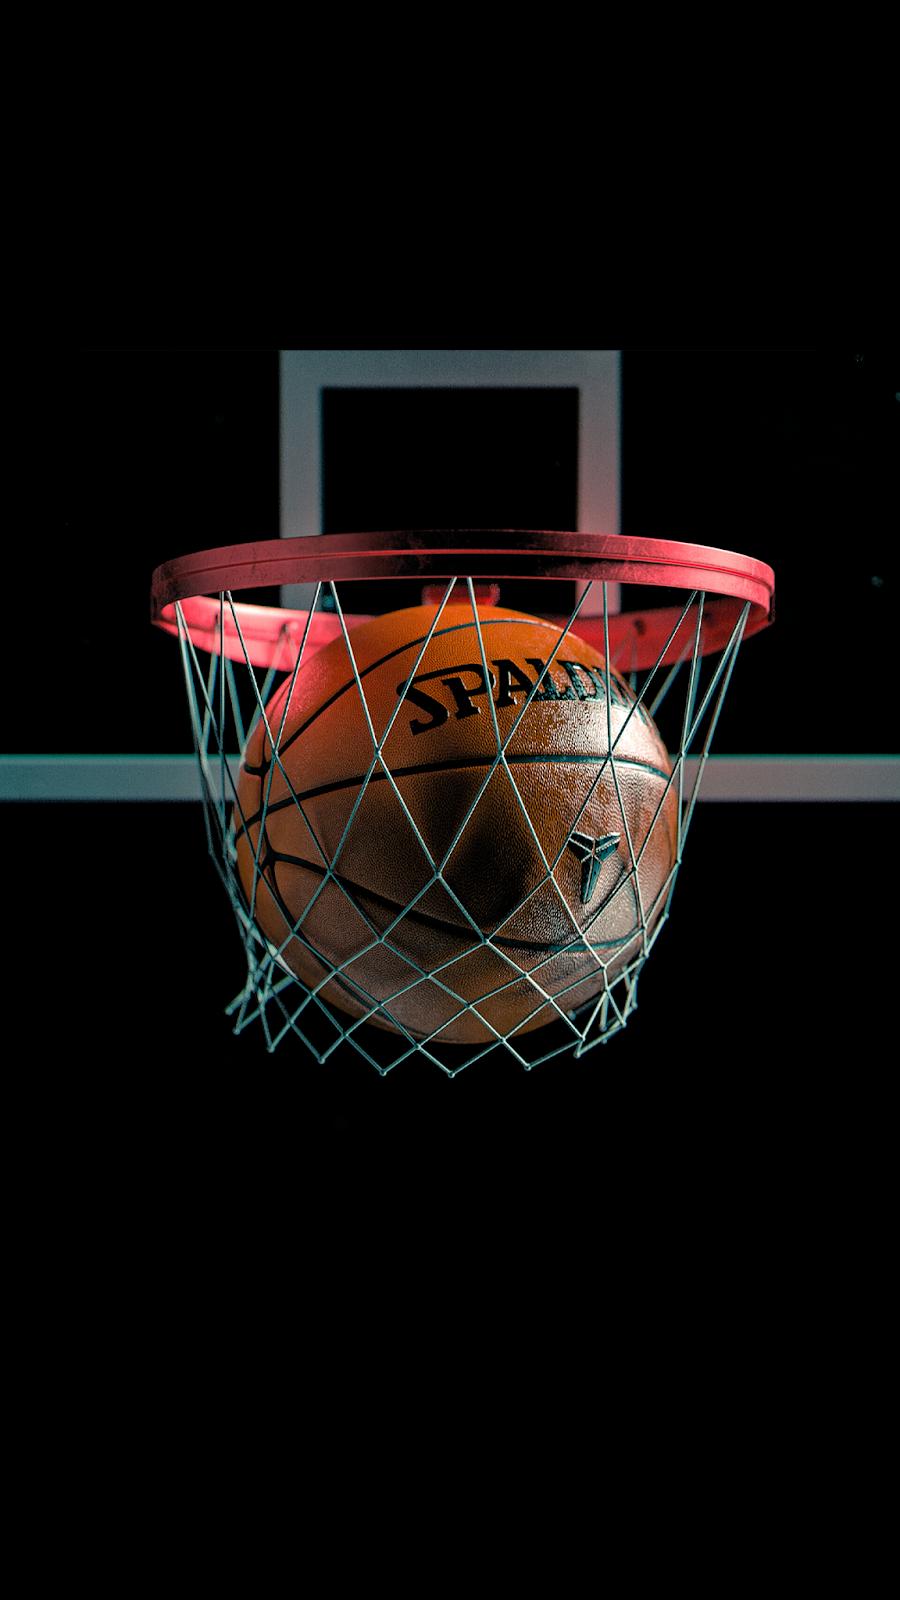 Kobe basket amoled wallpaper for mobile Cool basketball 900x1600